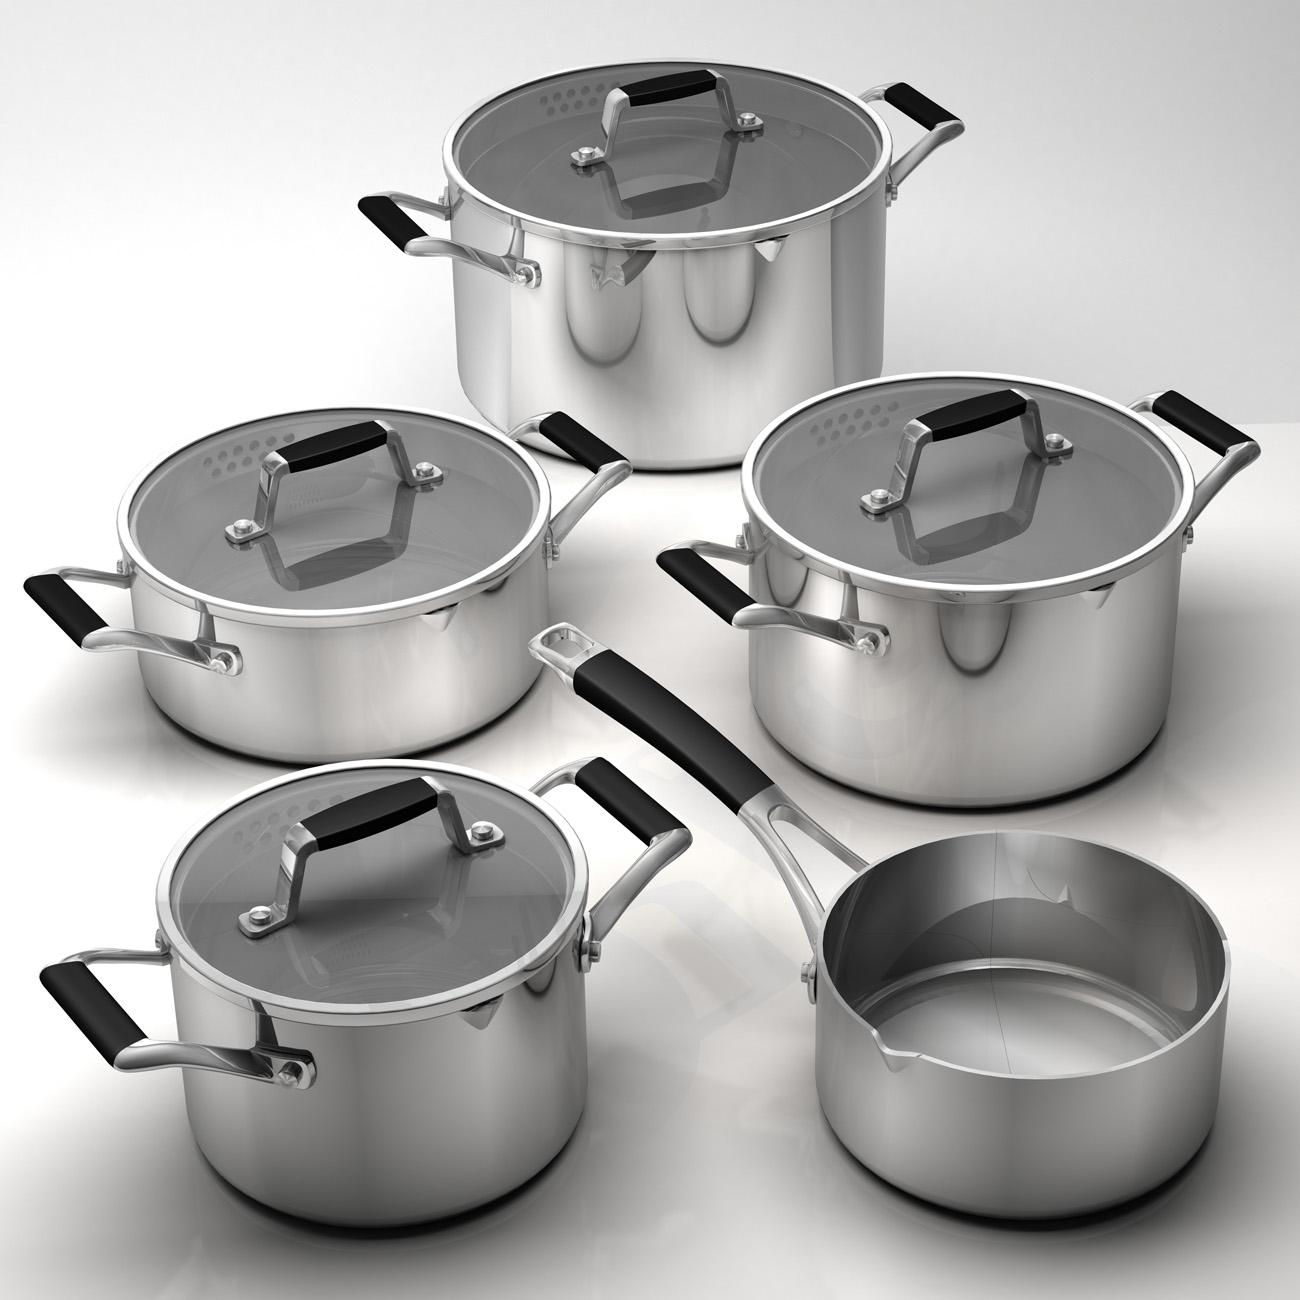 CUCINO-pot1